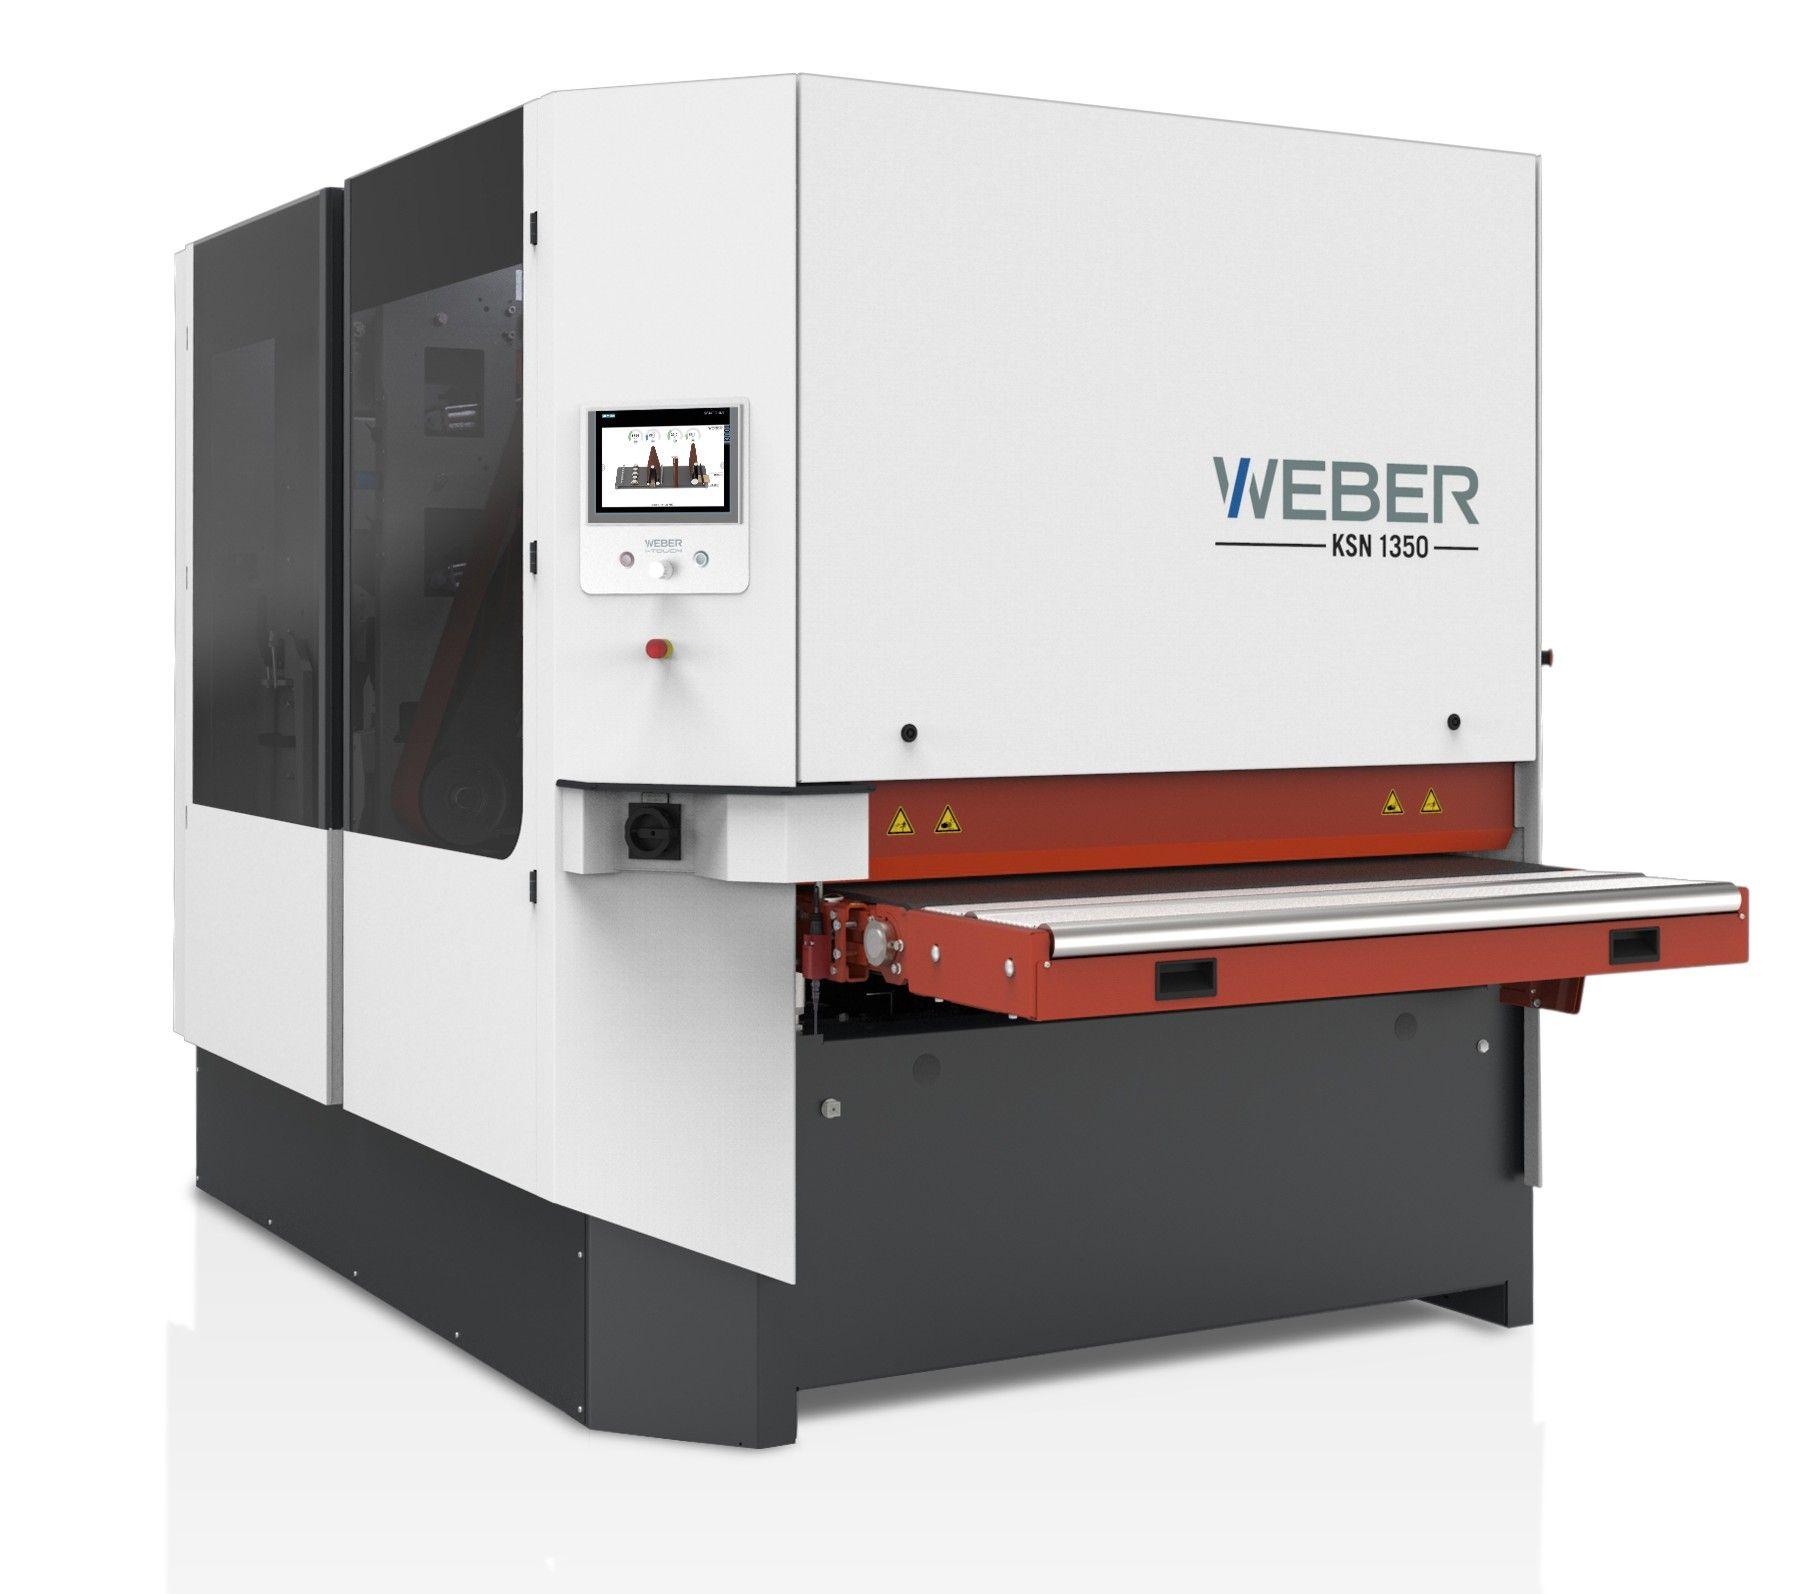 Weber automatic sanding machine KSN 1350